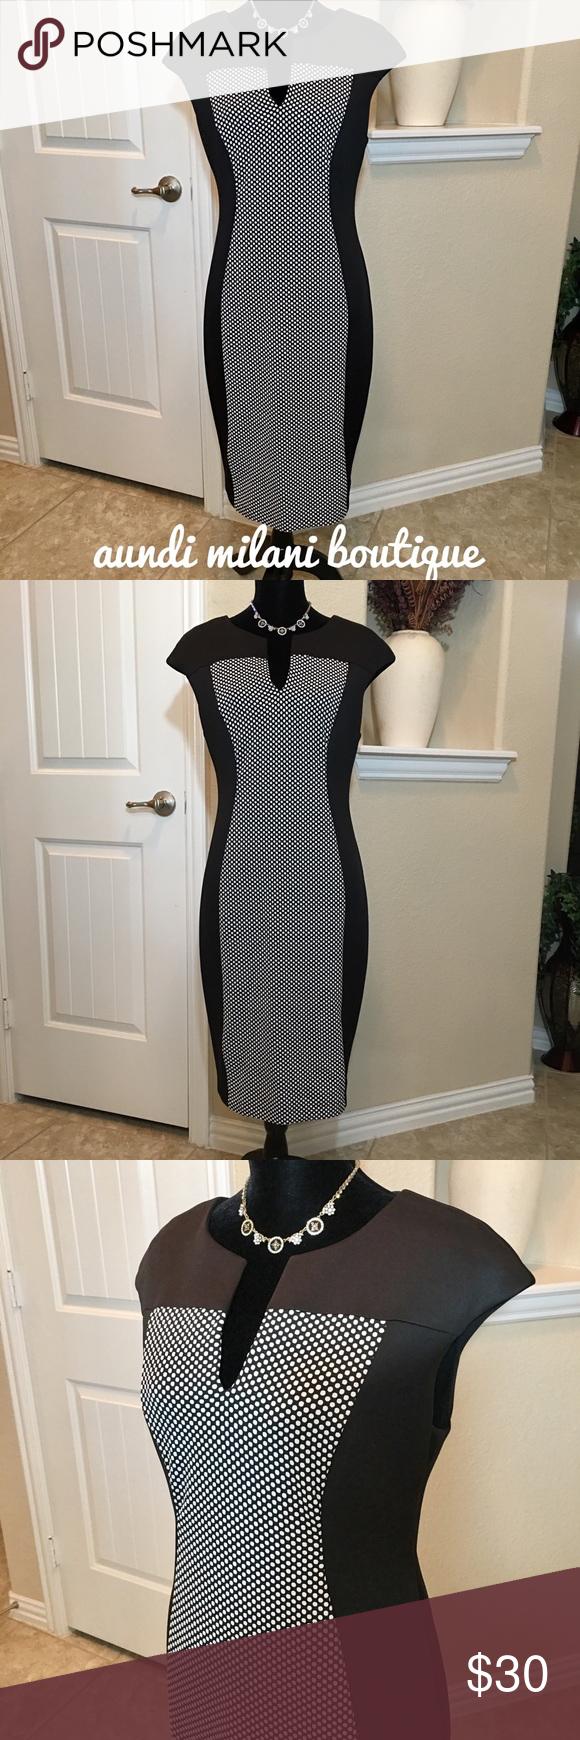 Black And White Sheath Dress White Sheath Dress Clothes Design Black Sheath Dress [ 1740 x 580 Pixel ]